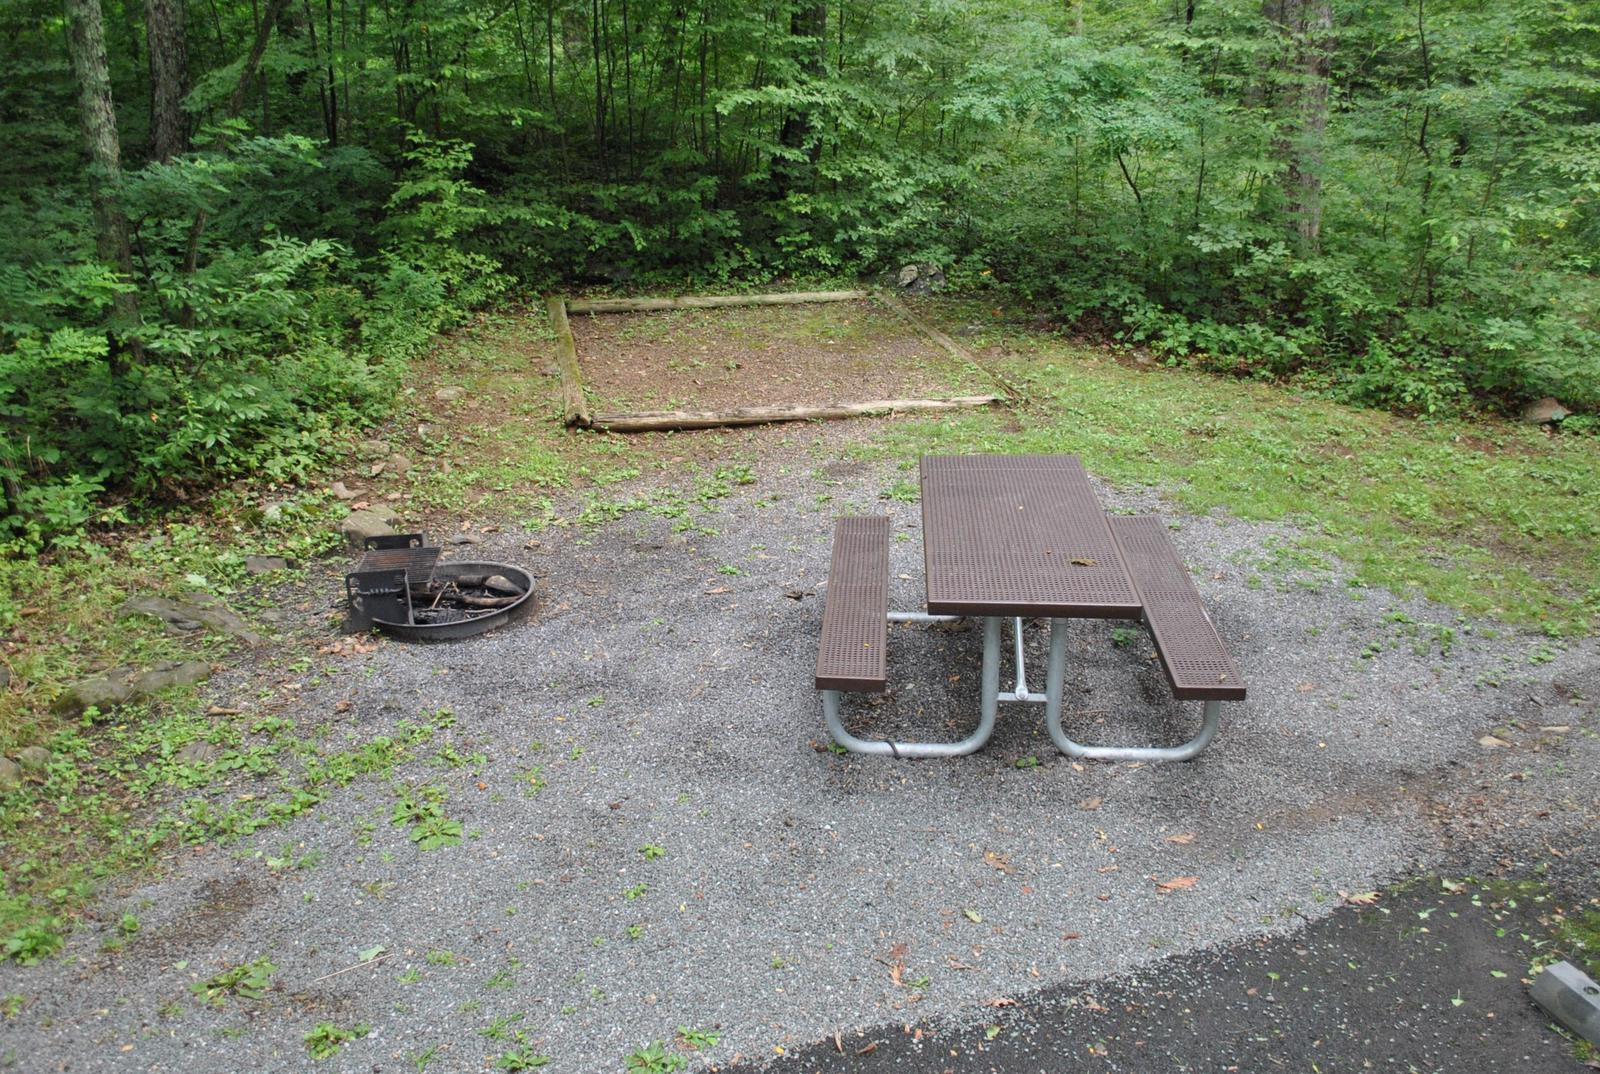 Mathews Arm Campground – Site A021